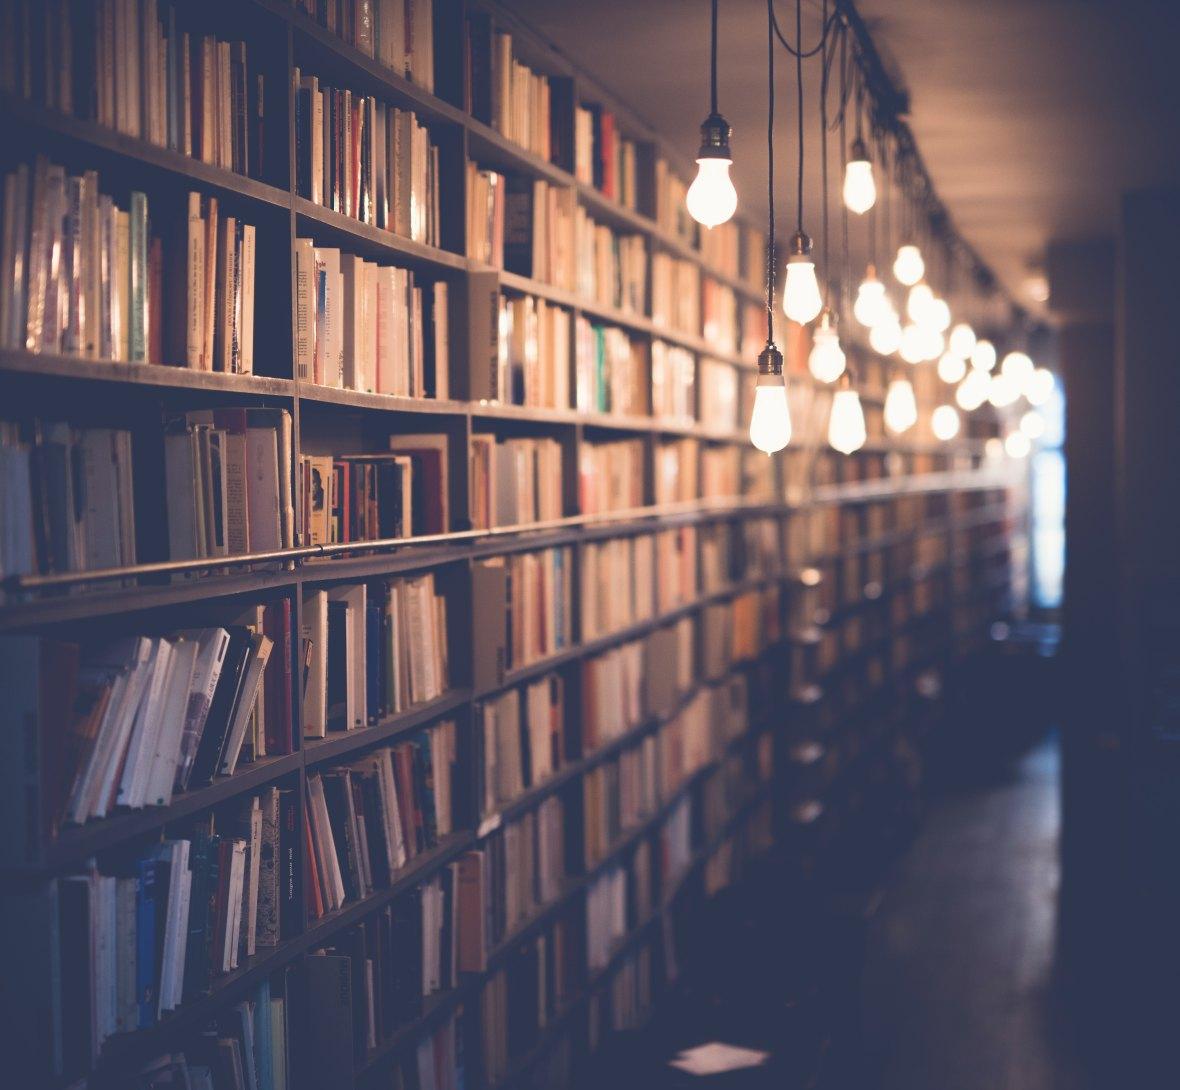 Bookstore by Janko Ferlic on Unsplash: The Modest Reader